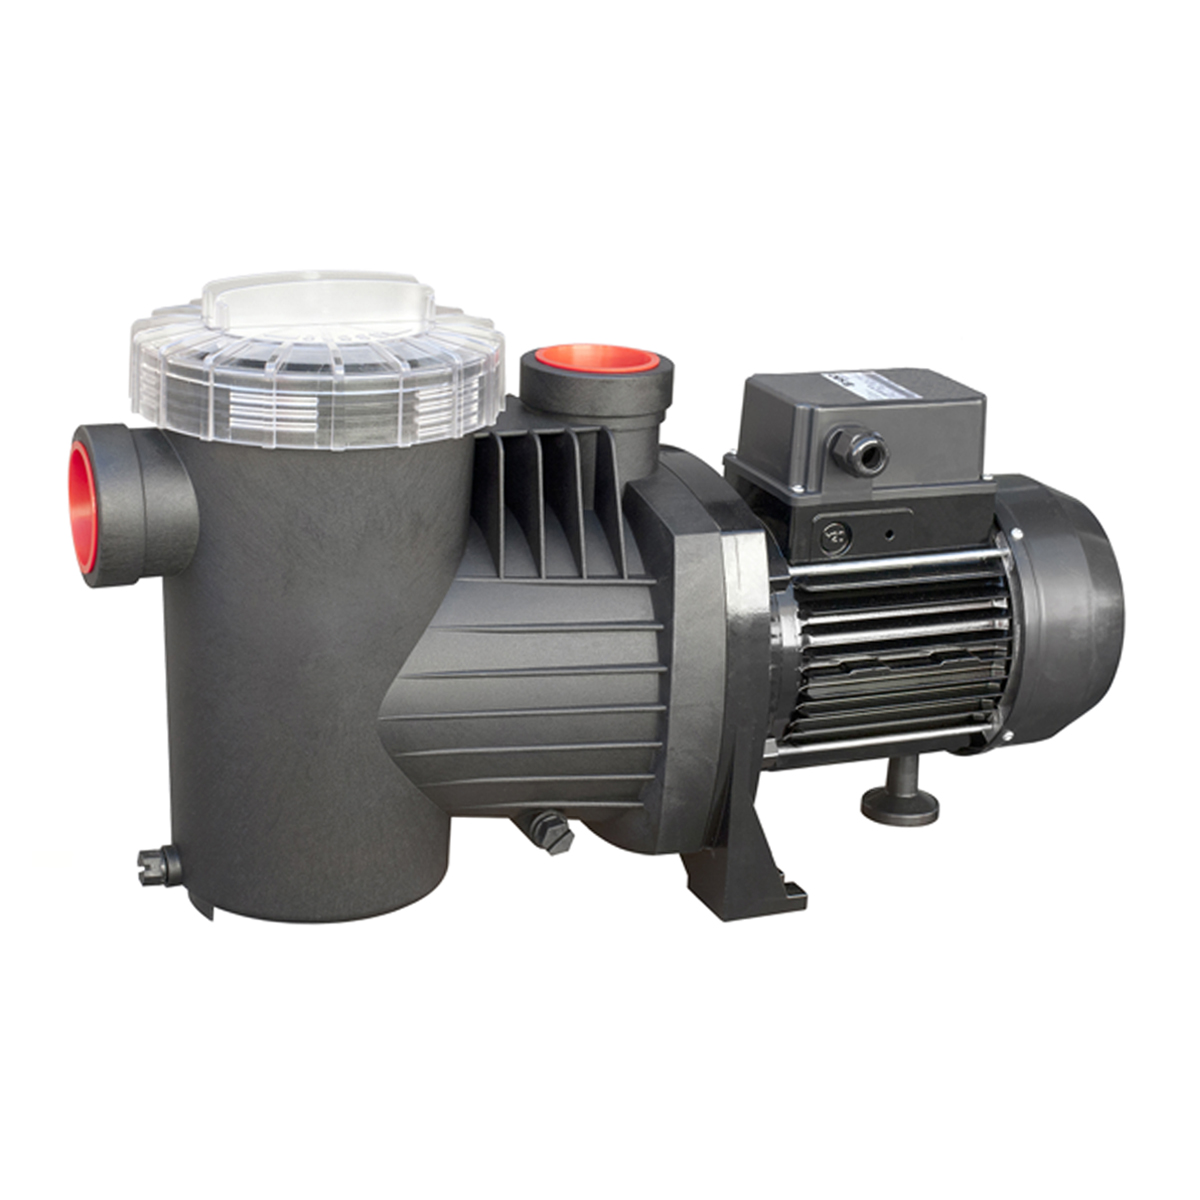 "Schwimmbadpumpe Smart W75 selbstansaugend 2""  13,5 m3/h bei 10m, P1 0,77 kW, P2 0,55 kW, 400V Schwimmbadpumpe Smart W75 selbstansaugend 2""  13,5 m3/h bei 10m, P1 0,77 kW, P2 0,55 kW, 400V"